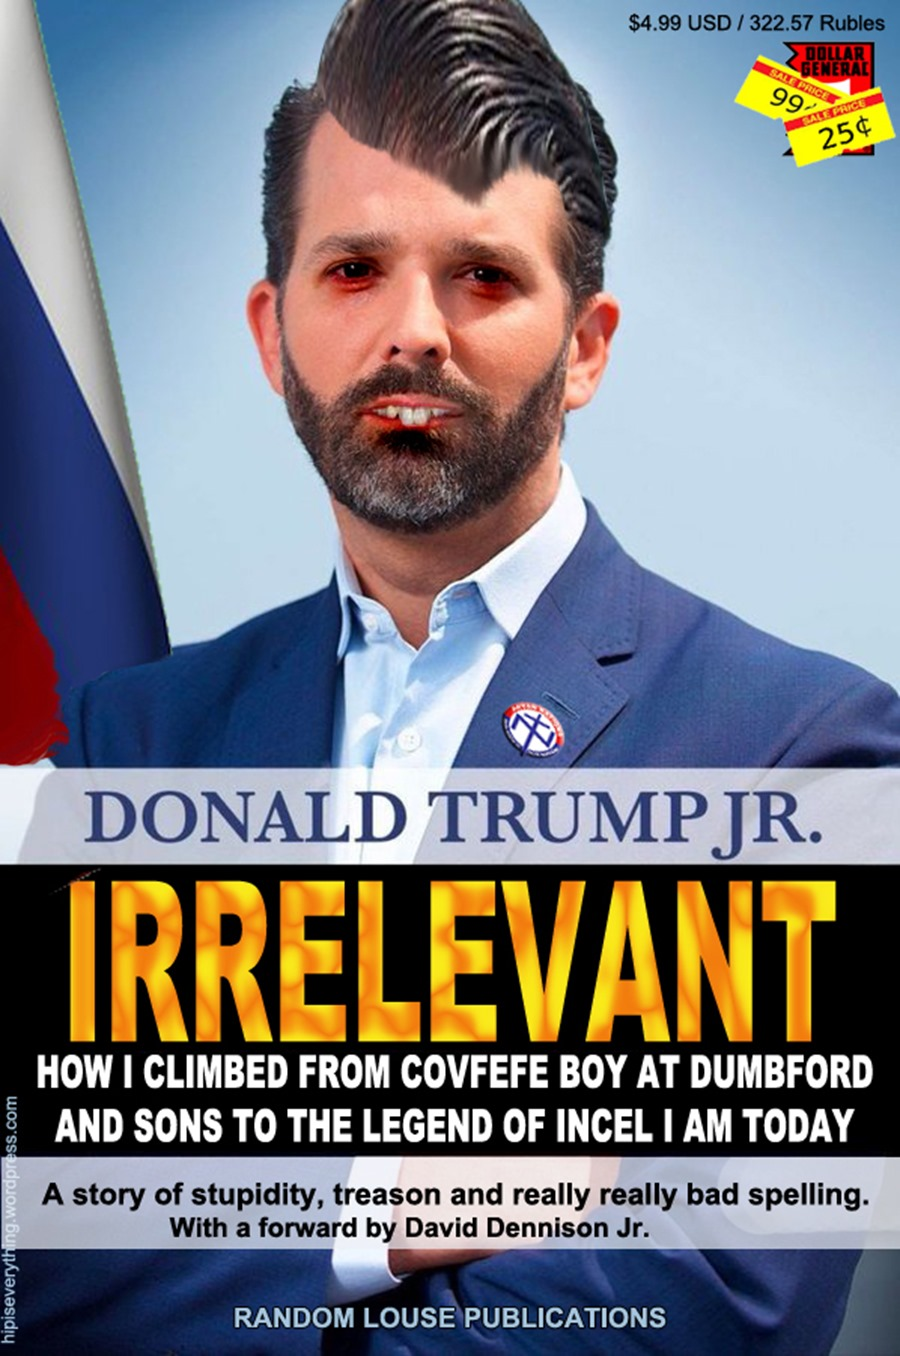 irrelevant - the Don Jr Story